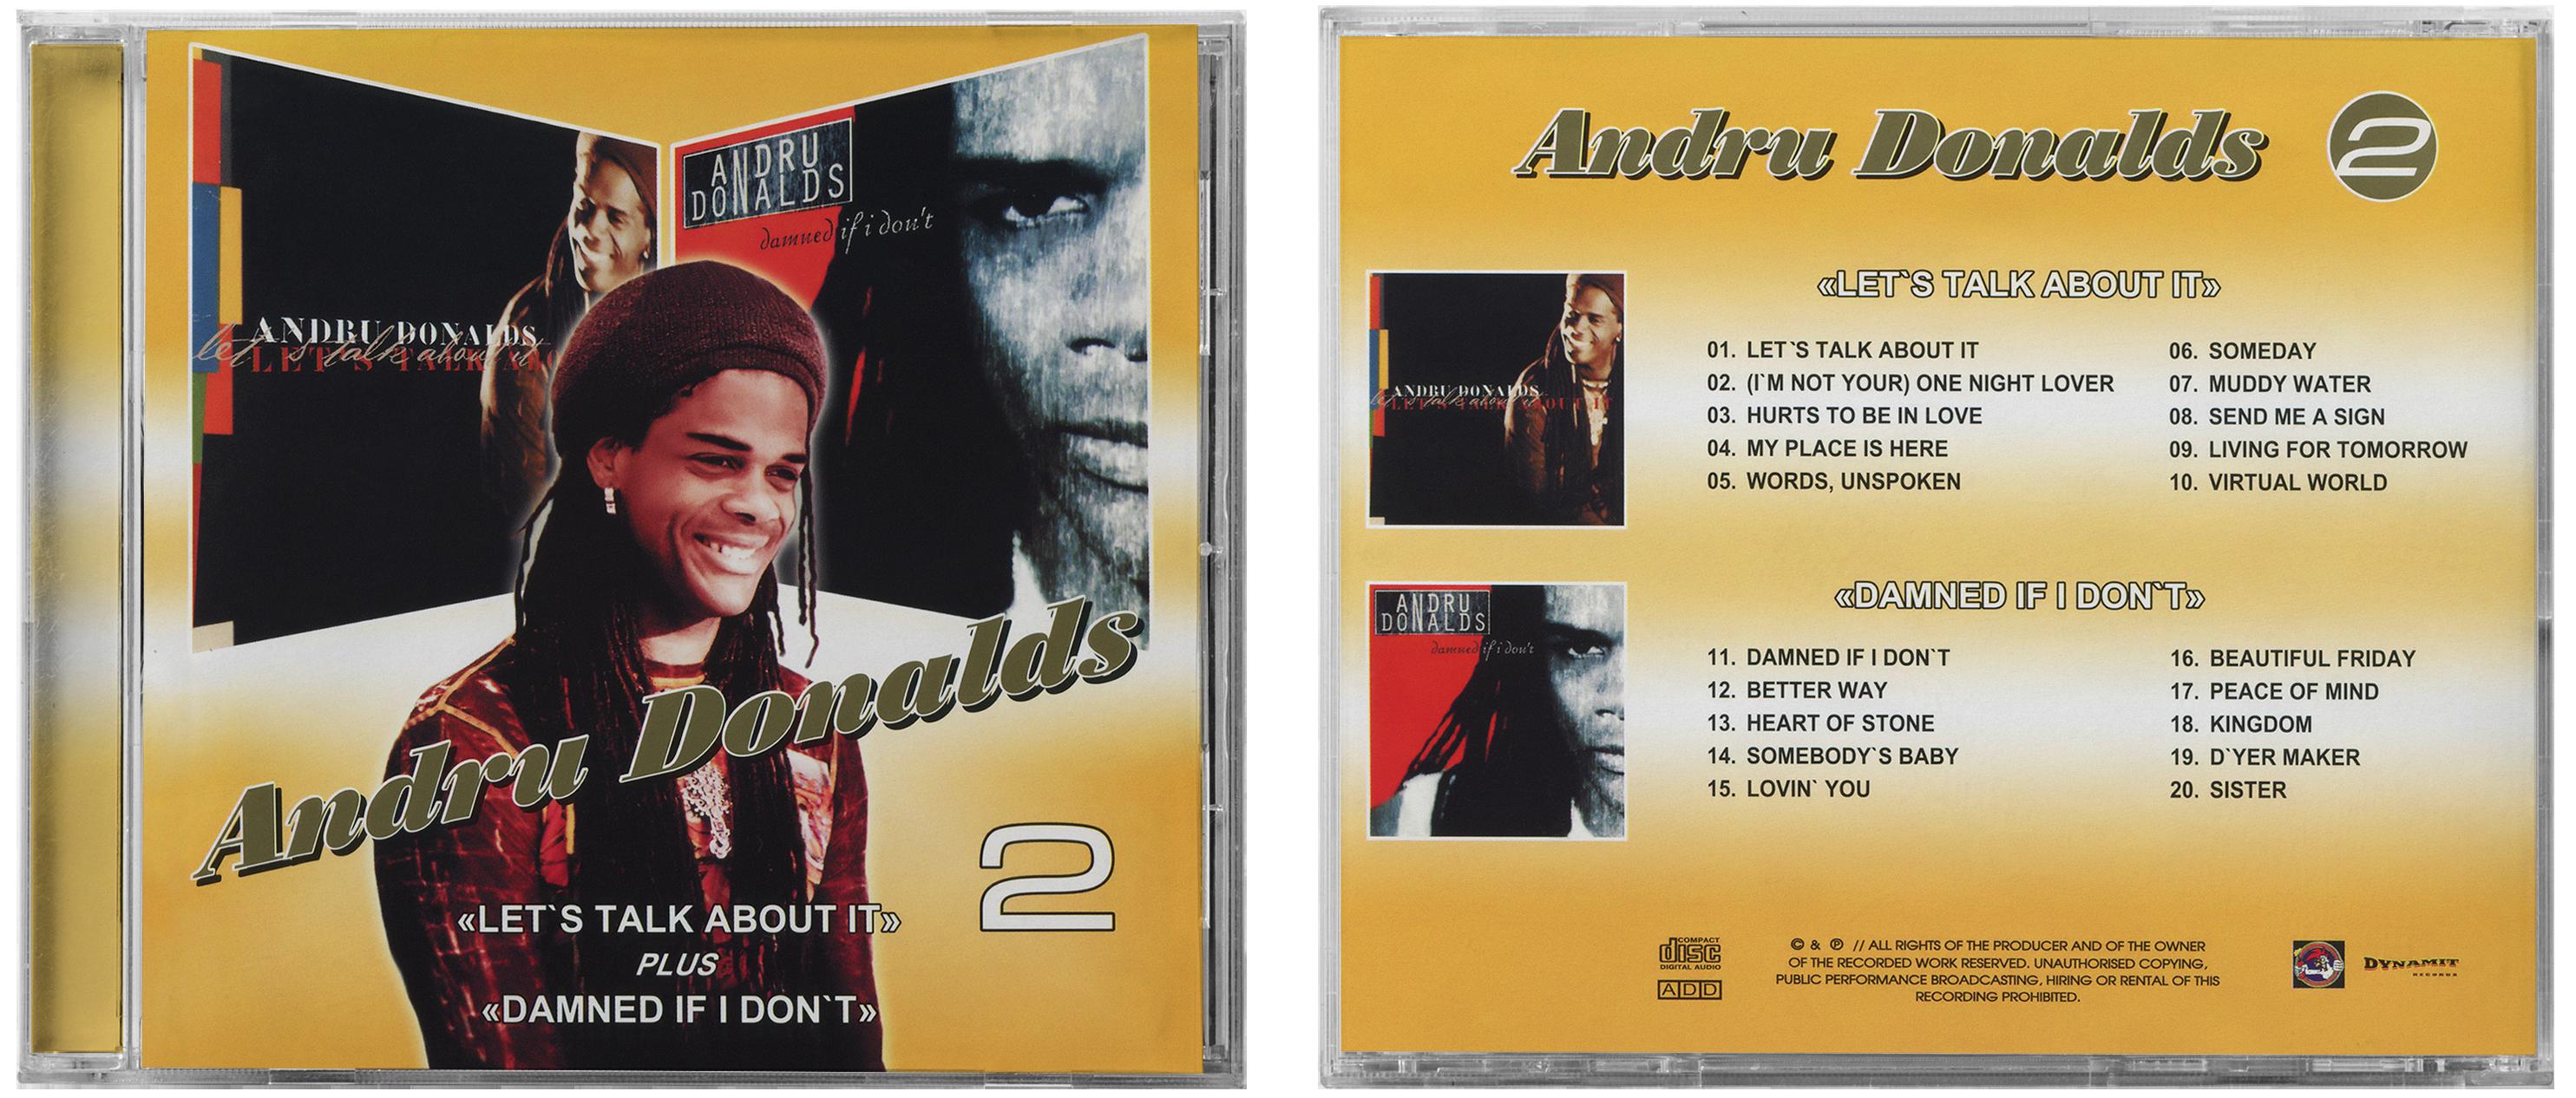 bootleg-andru-donalds-dynamit-records-2.